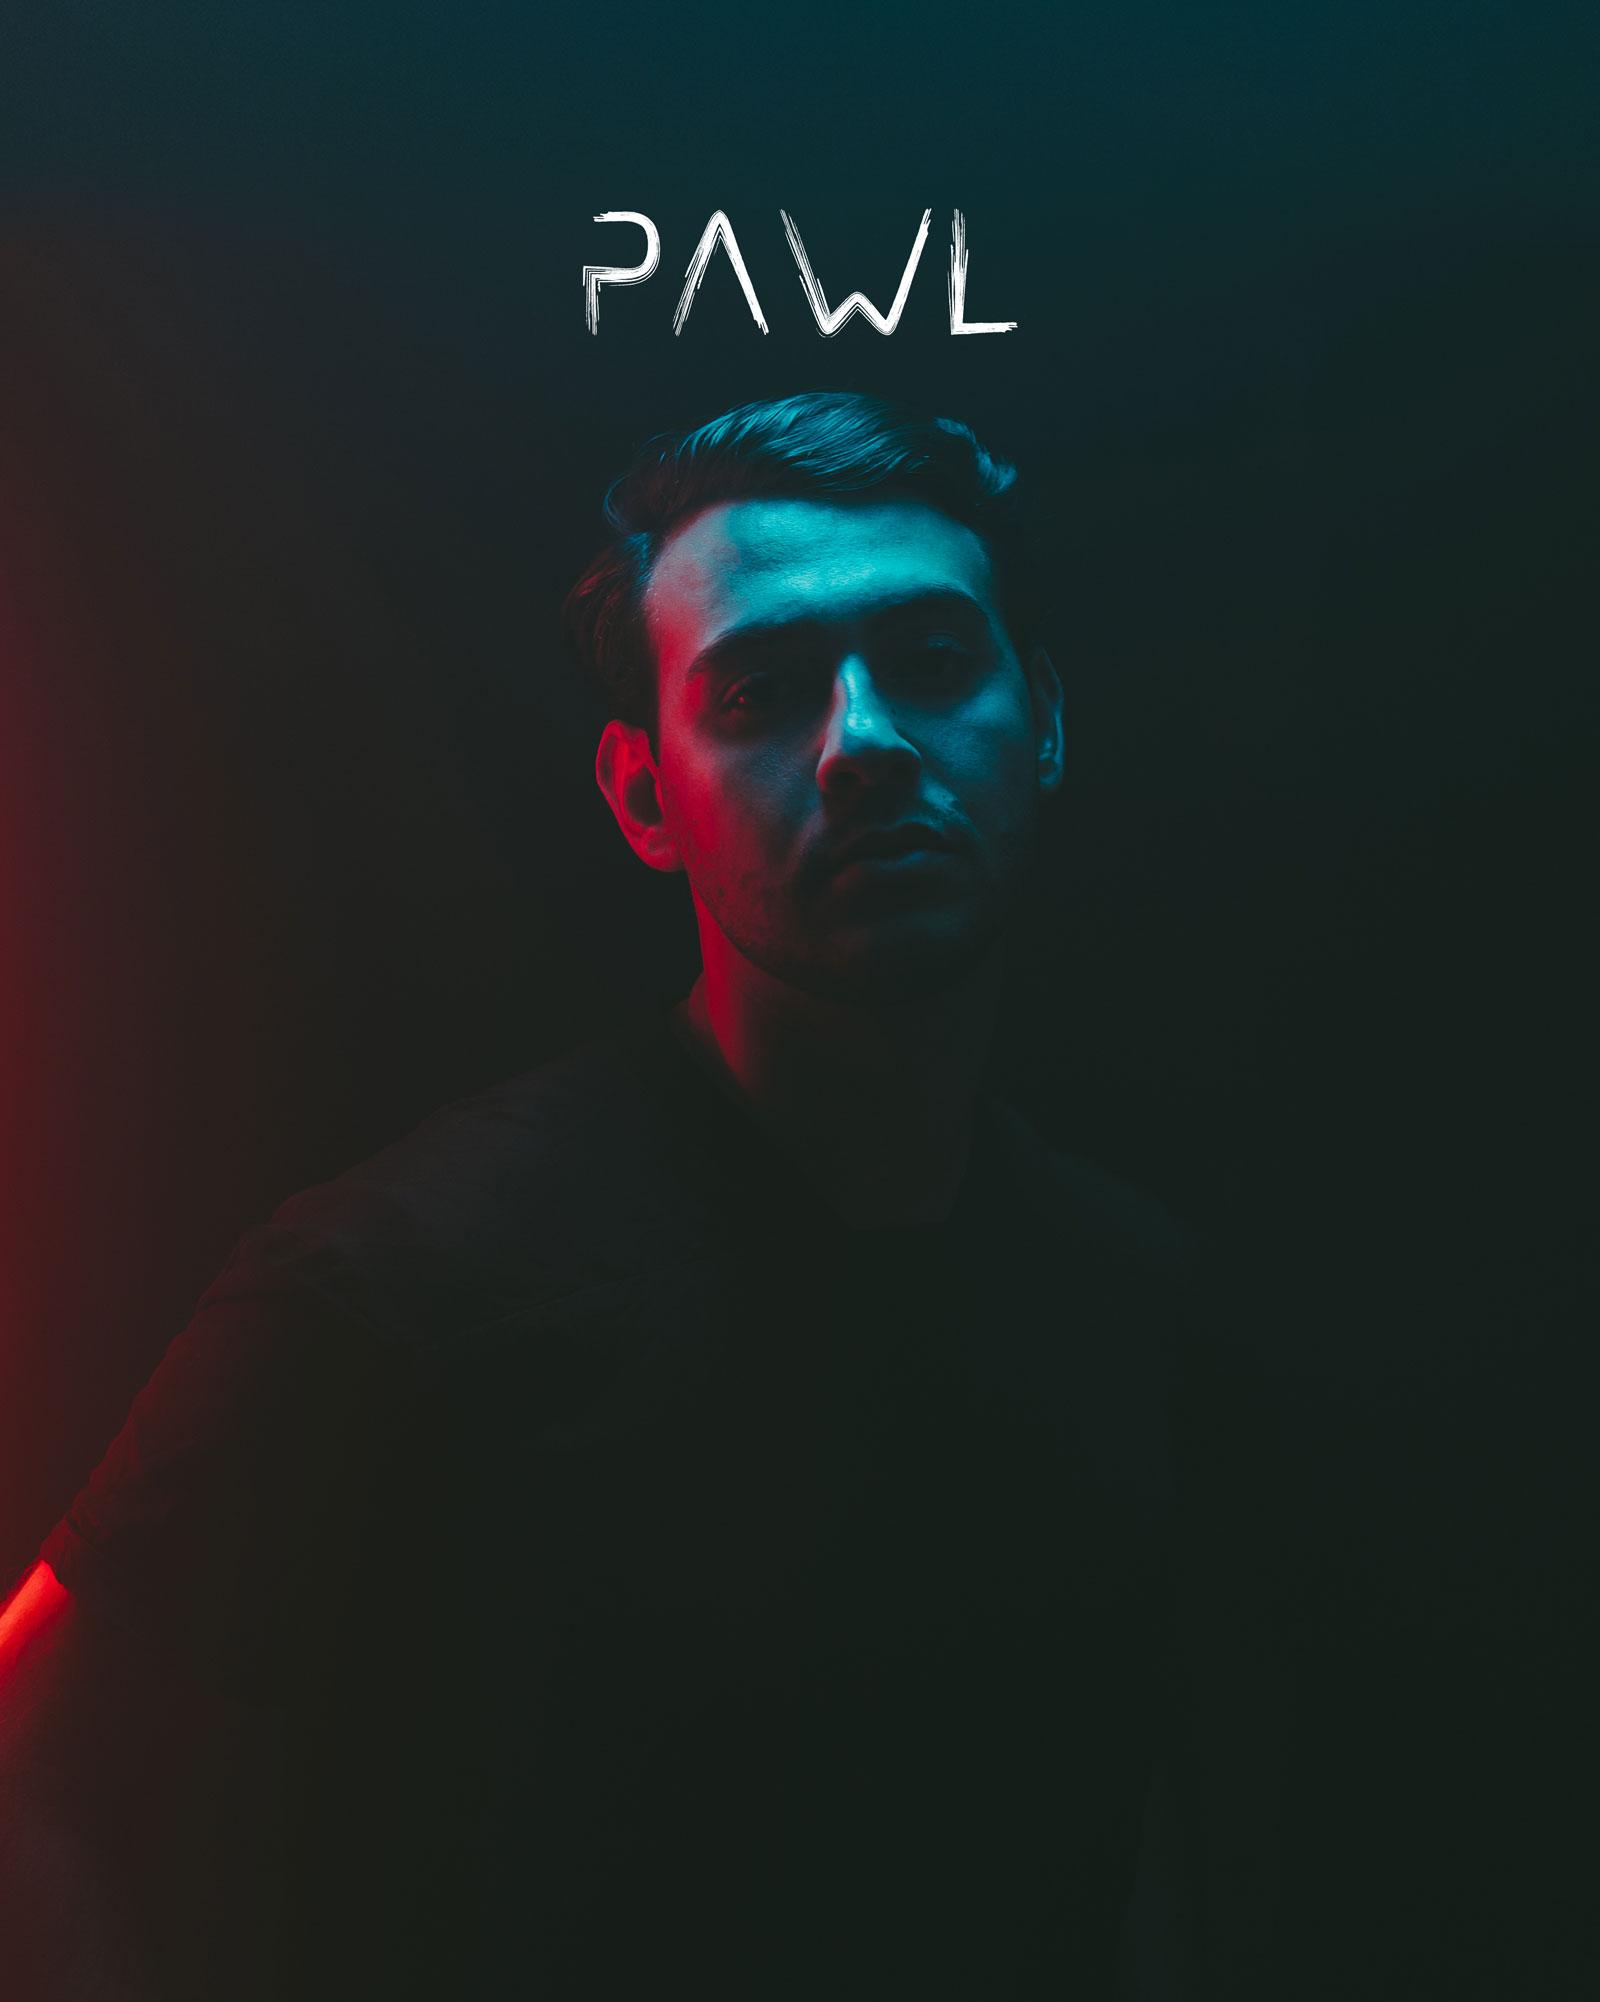 pawl-hero